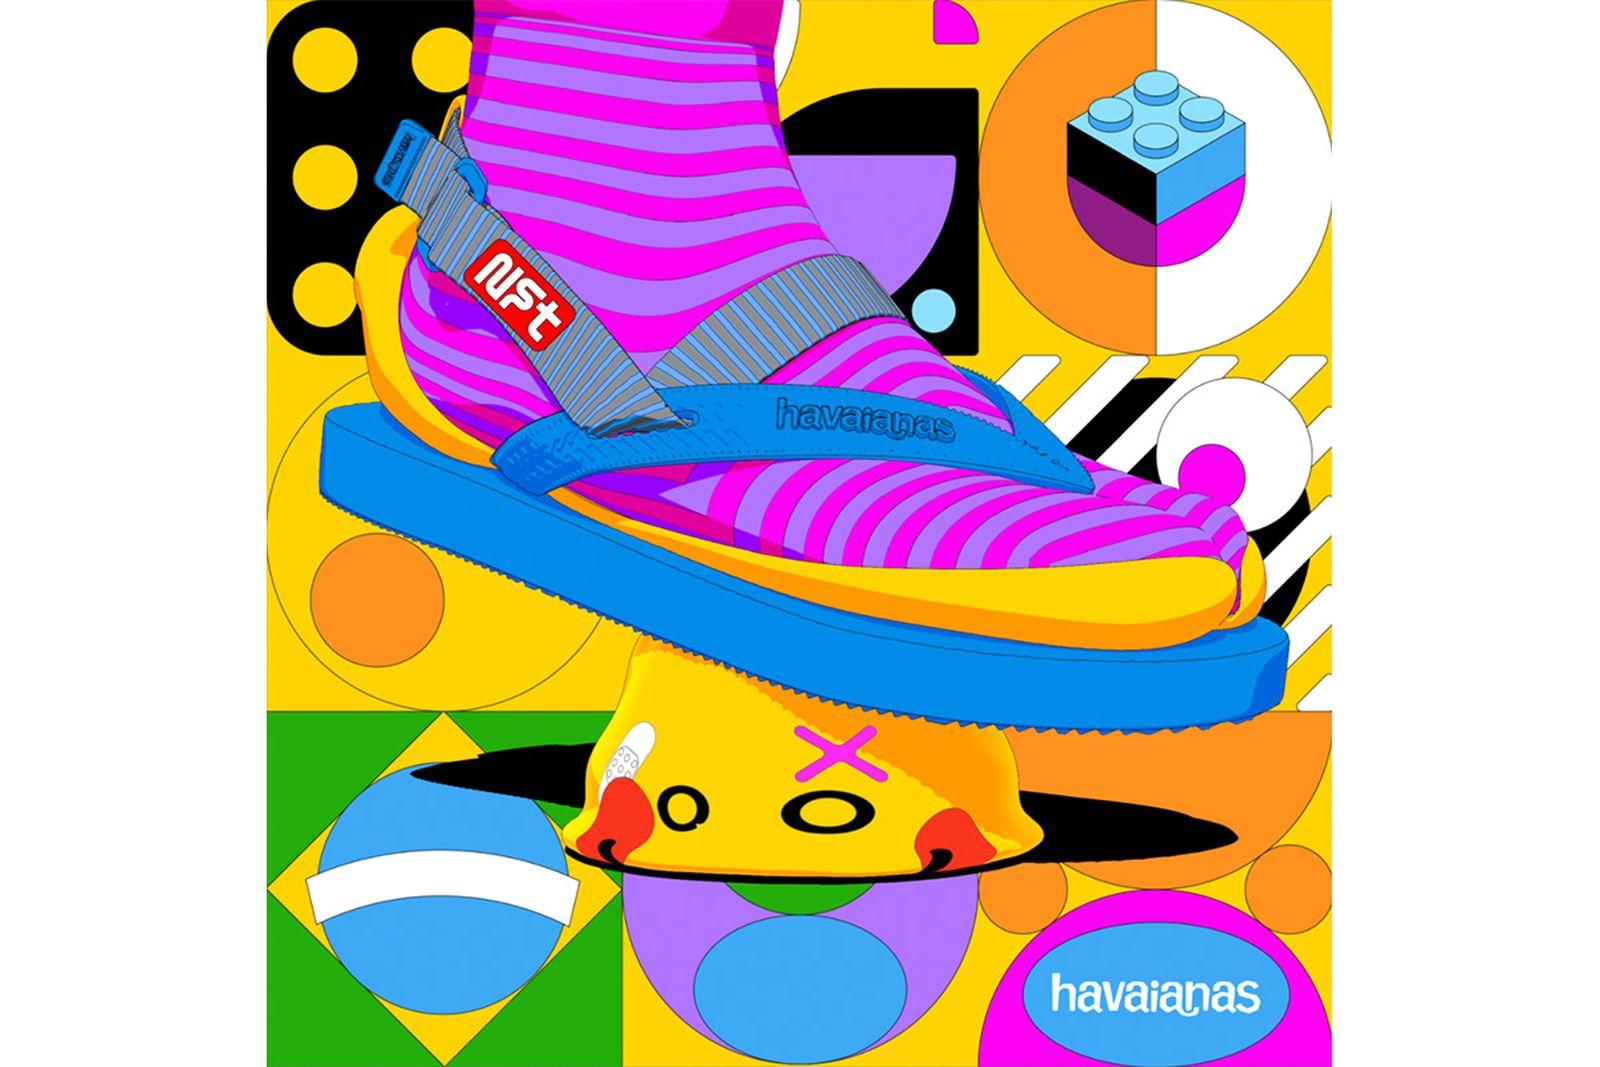 havaianas-nft-01